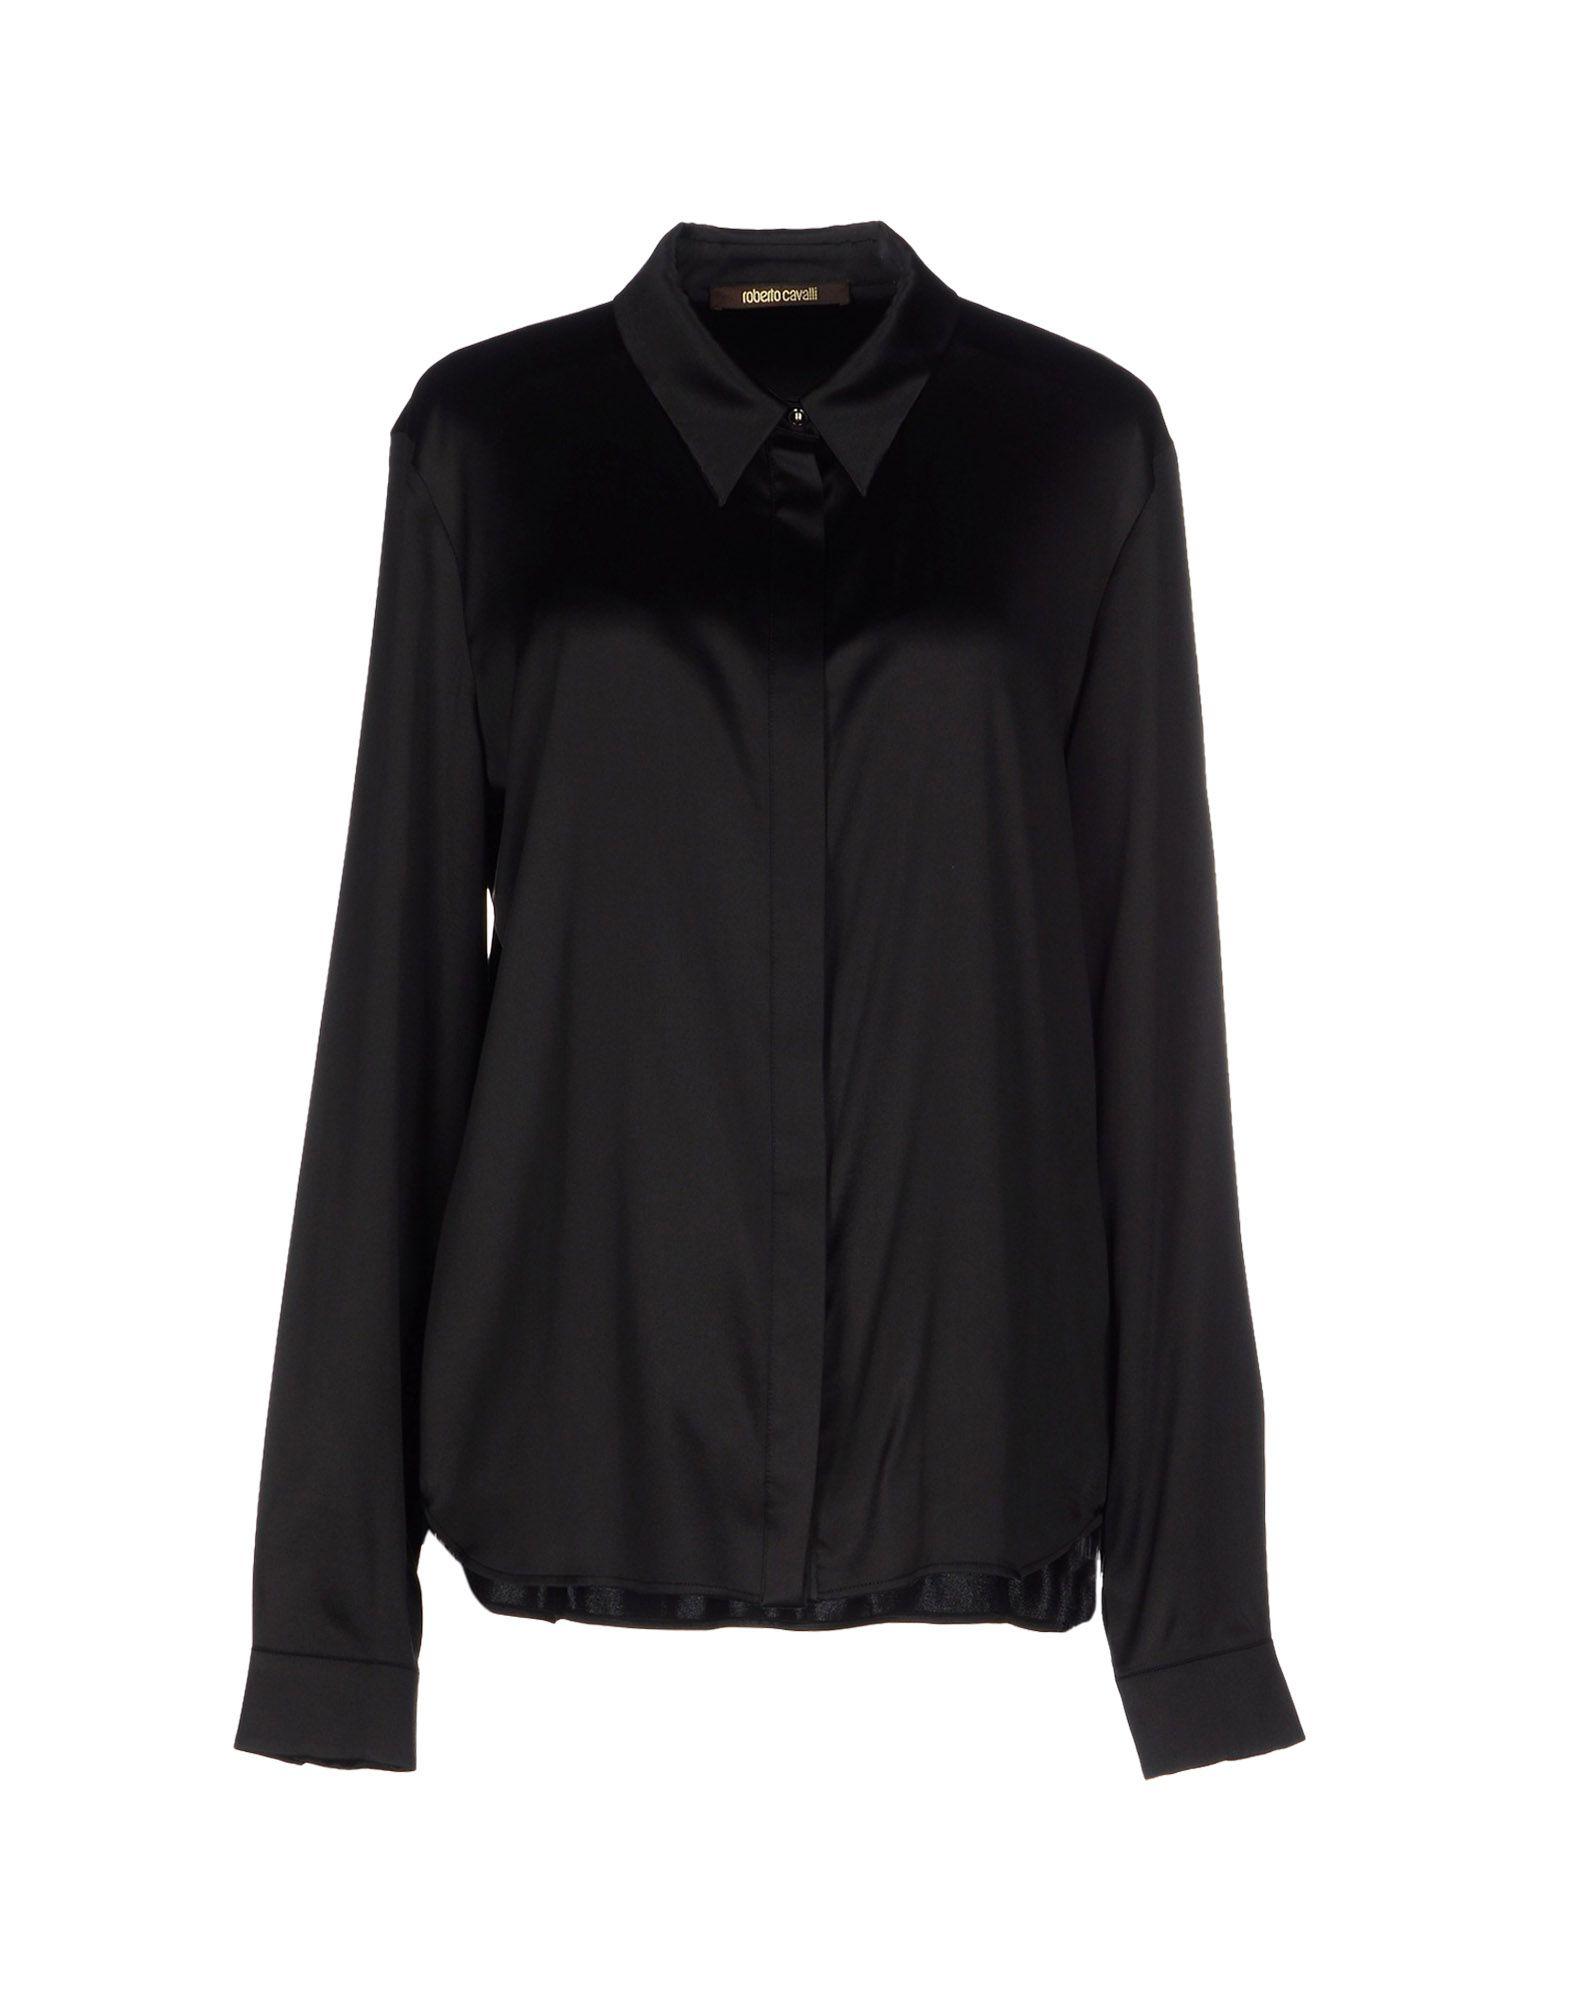 ROBERTO CAVALLI Pубашка brand 2017 hoodie new zipper cuff print casual hoodies men fashion tracksuit male sweatshirt off white hoody mens purpose tour